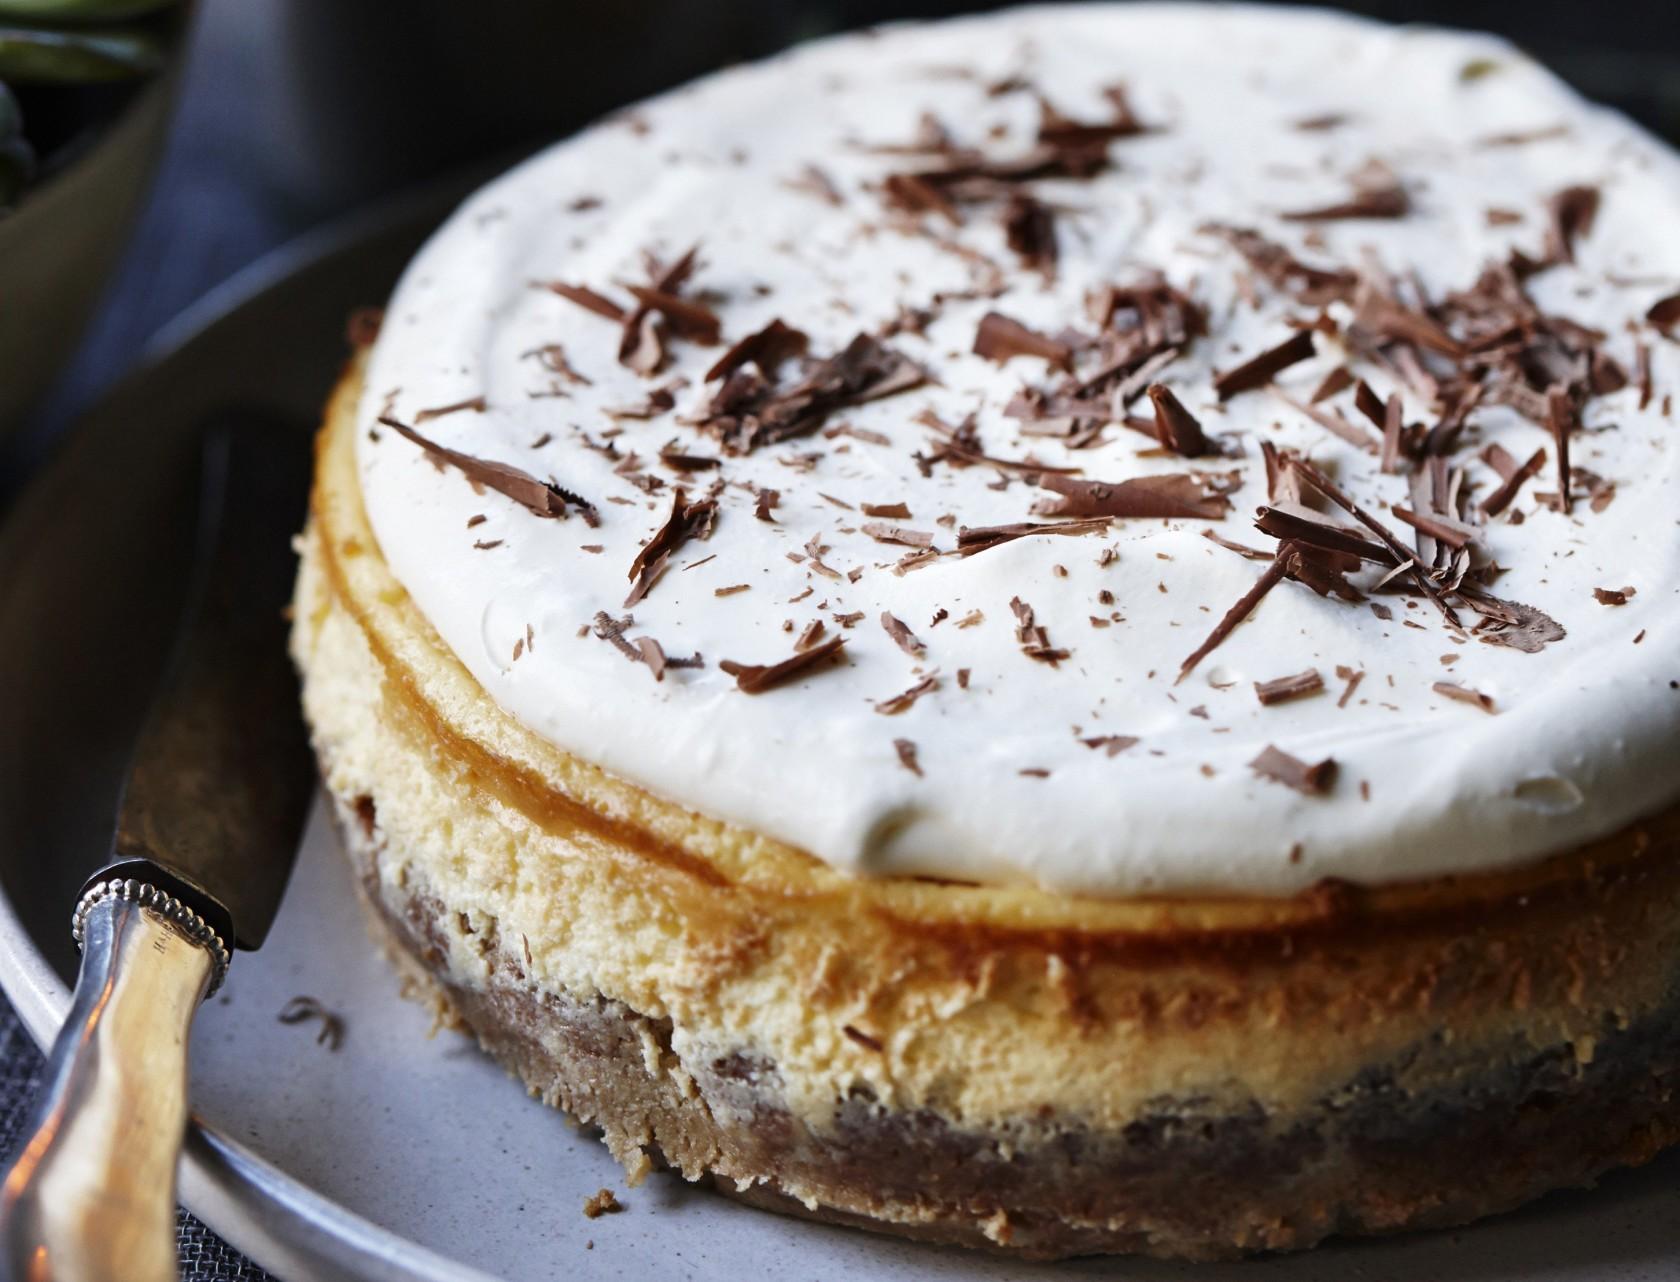 Fantastisk cheesecake med mandelbund og høvlet chokolade